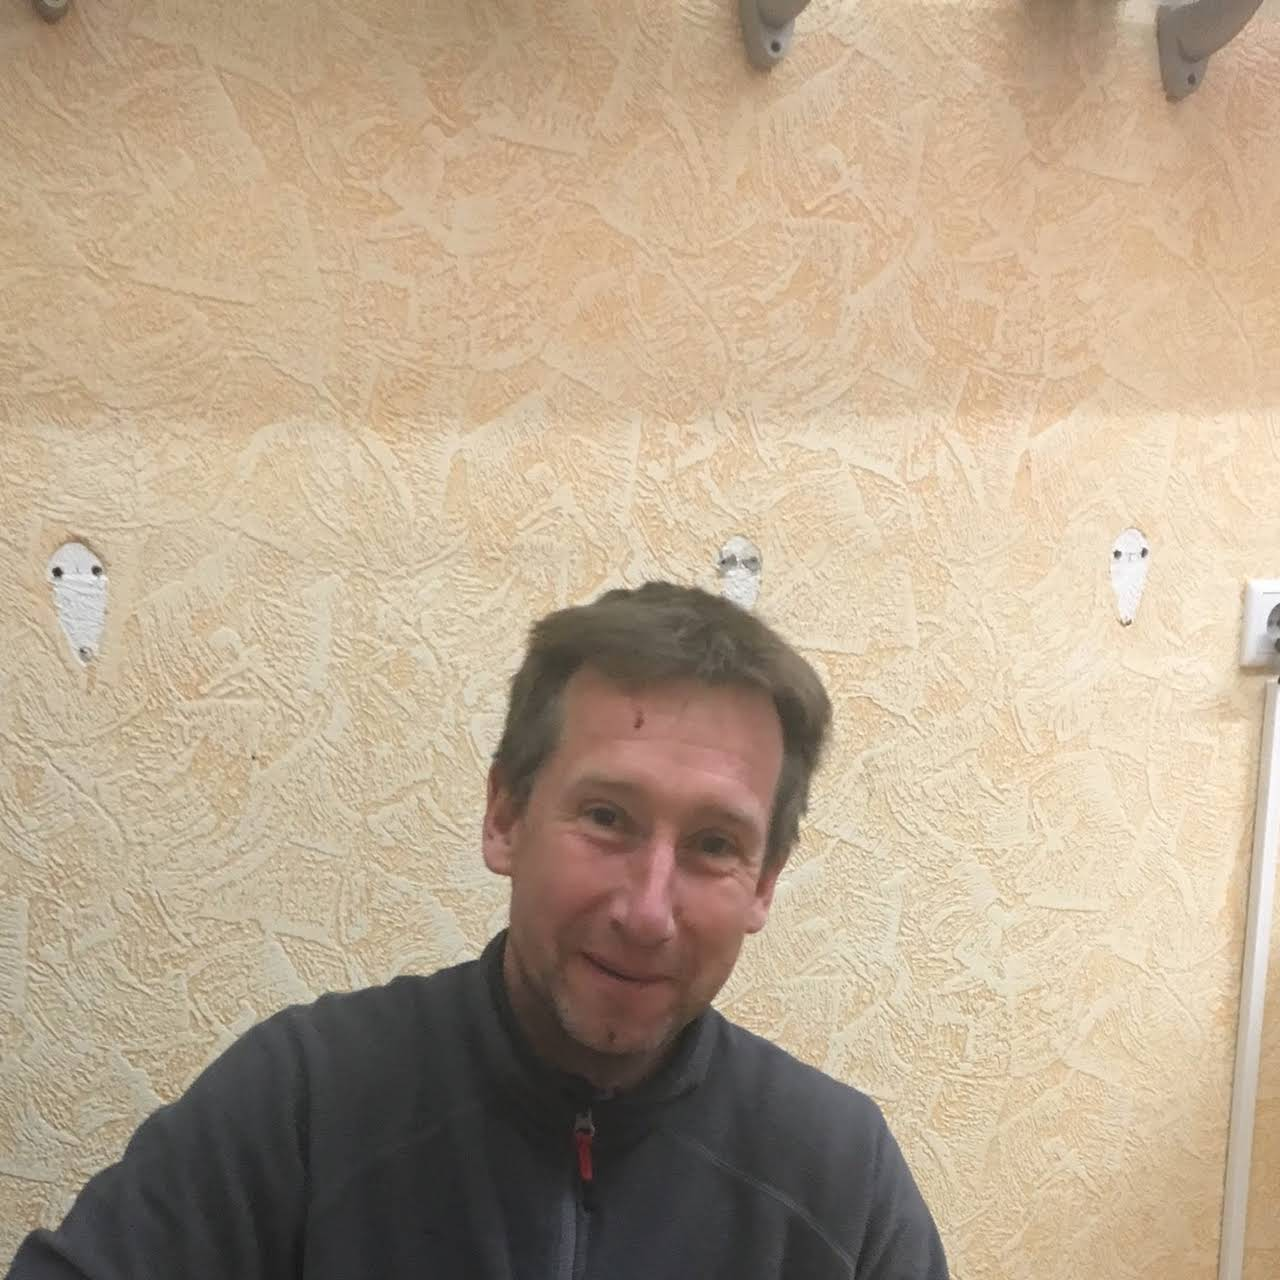 hairteam-friseur - friseursalon in brandenburg